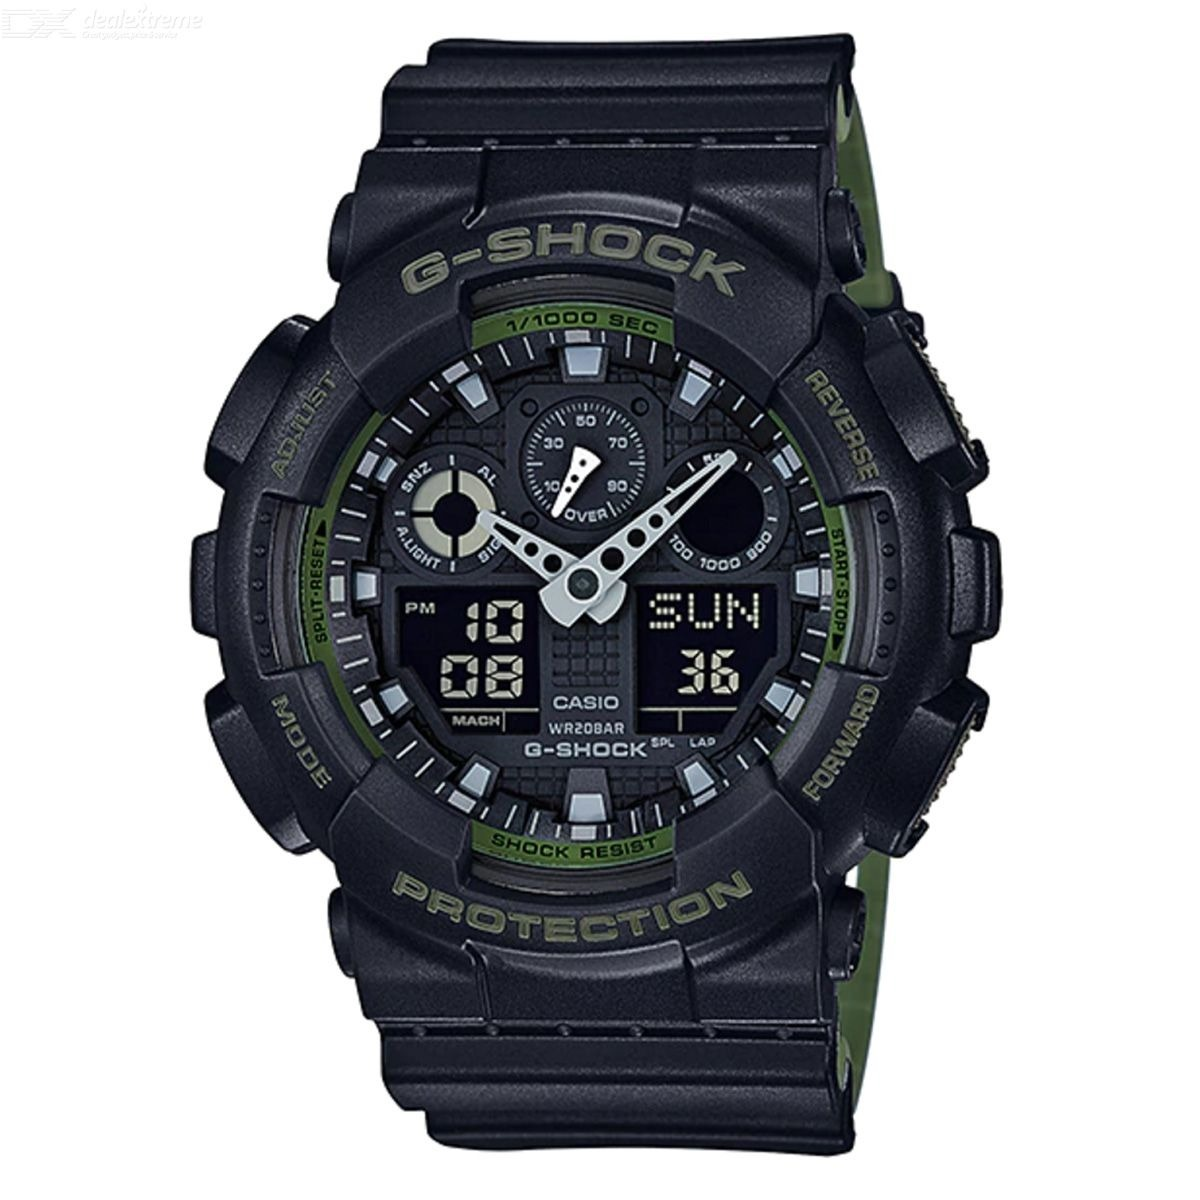 Casio Shock CajaVideo G Reloj En Ga100l Original Nuevo R34jAL5